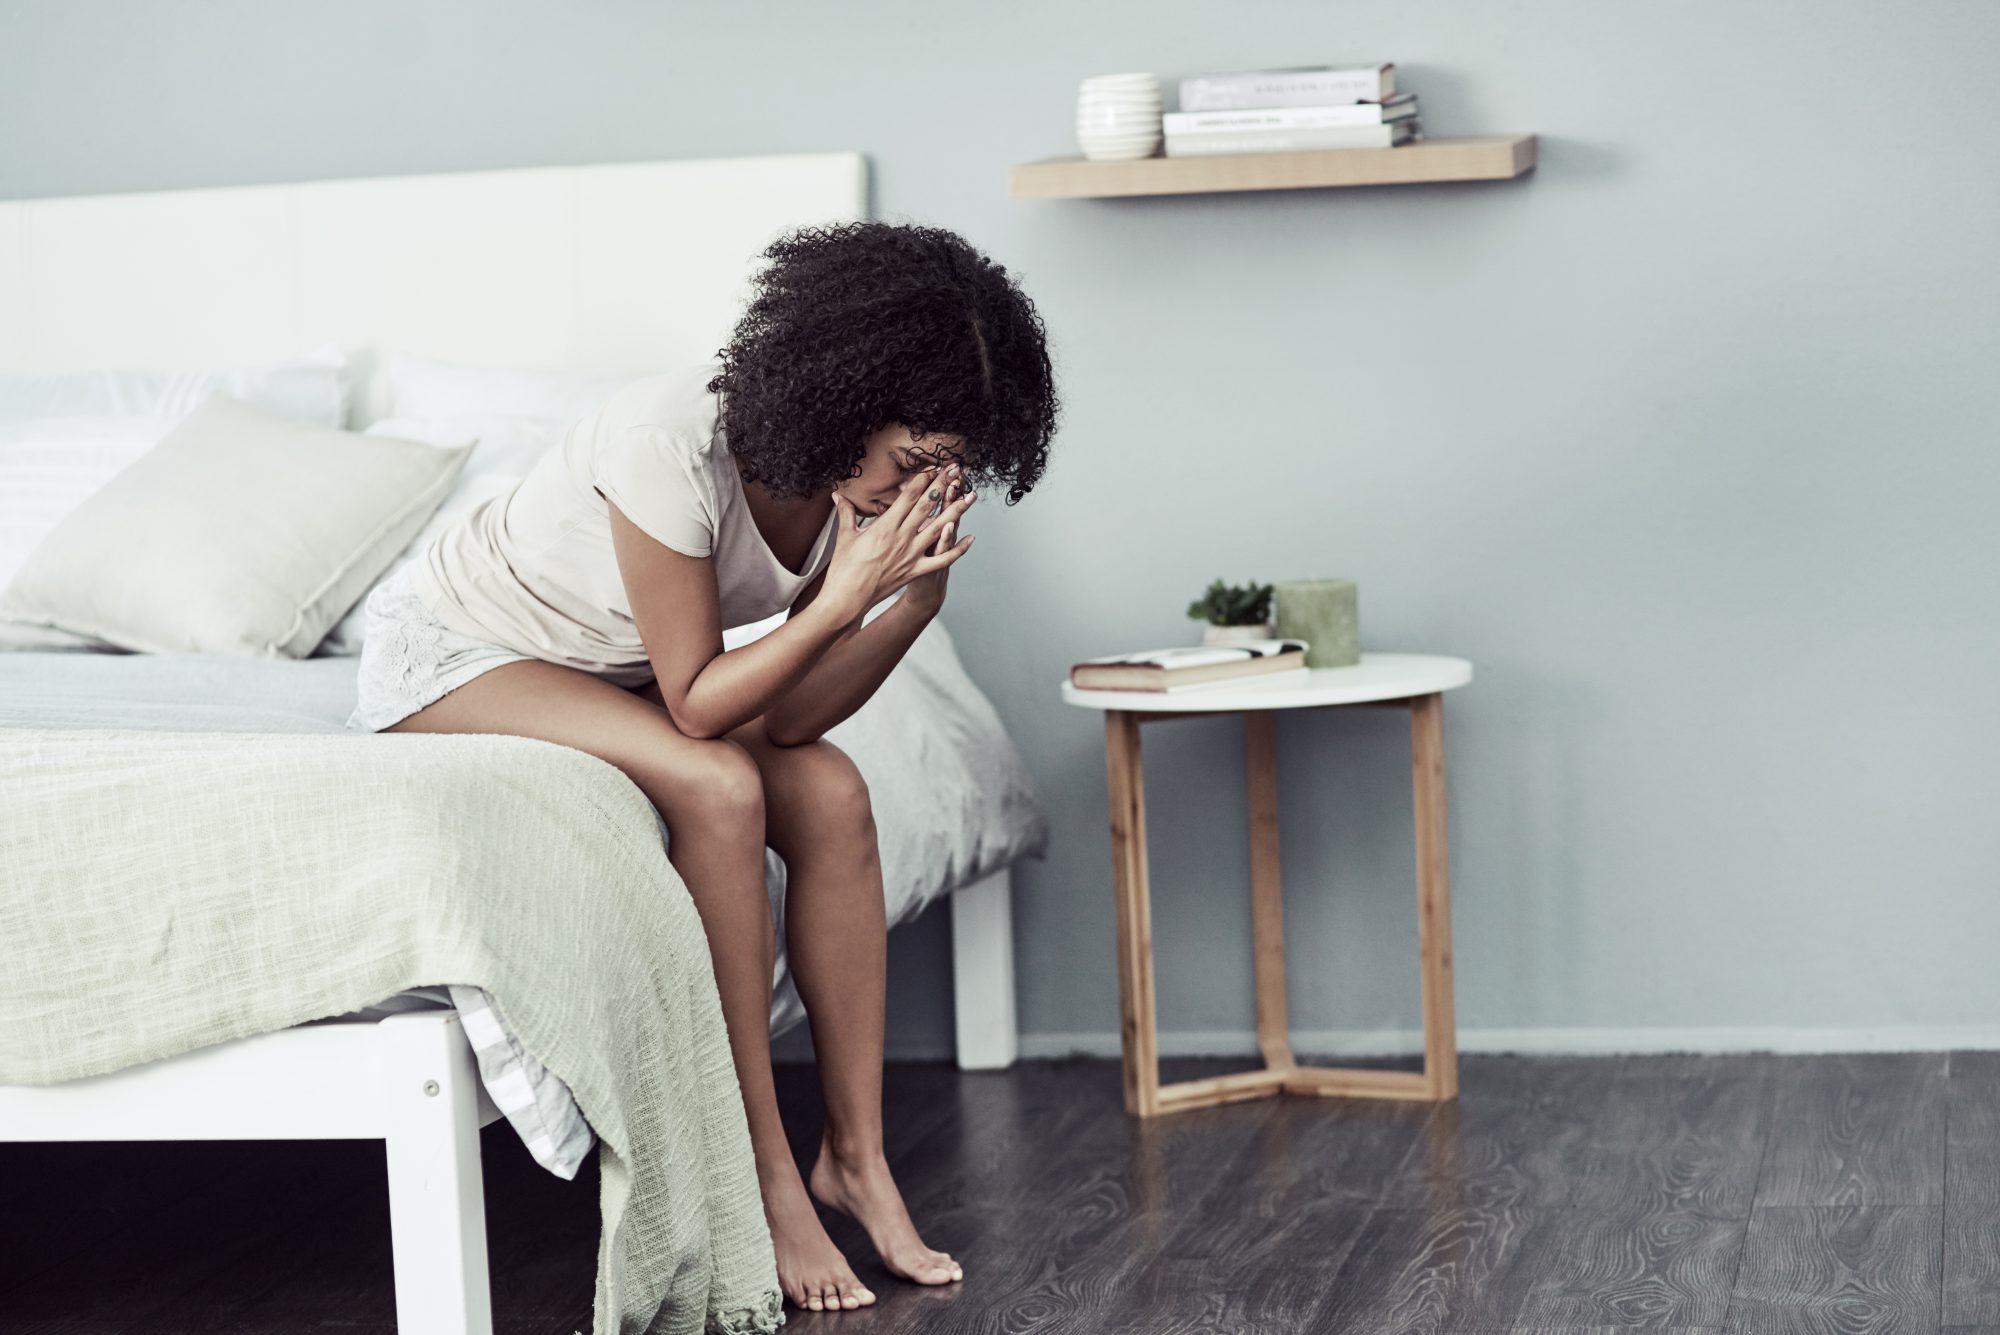 women, pain, antidepressants